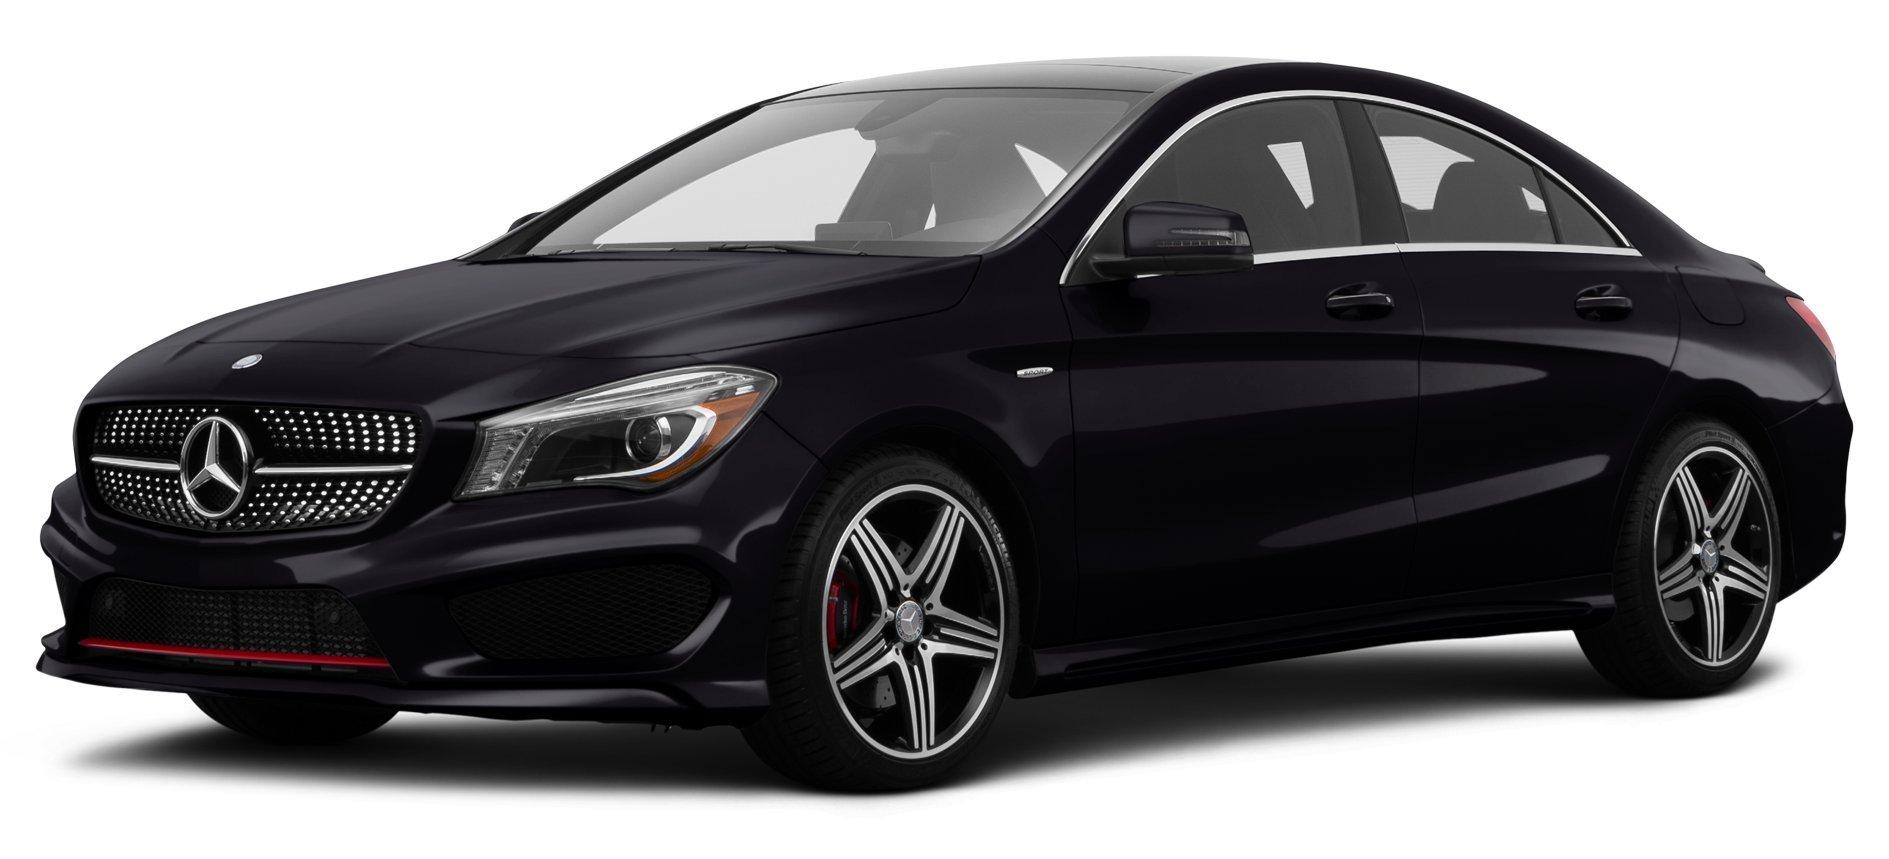 Amazon.com: 2016 Mercedes-Benz CLA250 Reviews, Images, and ...